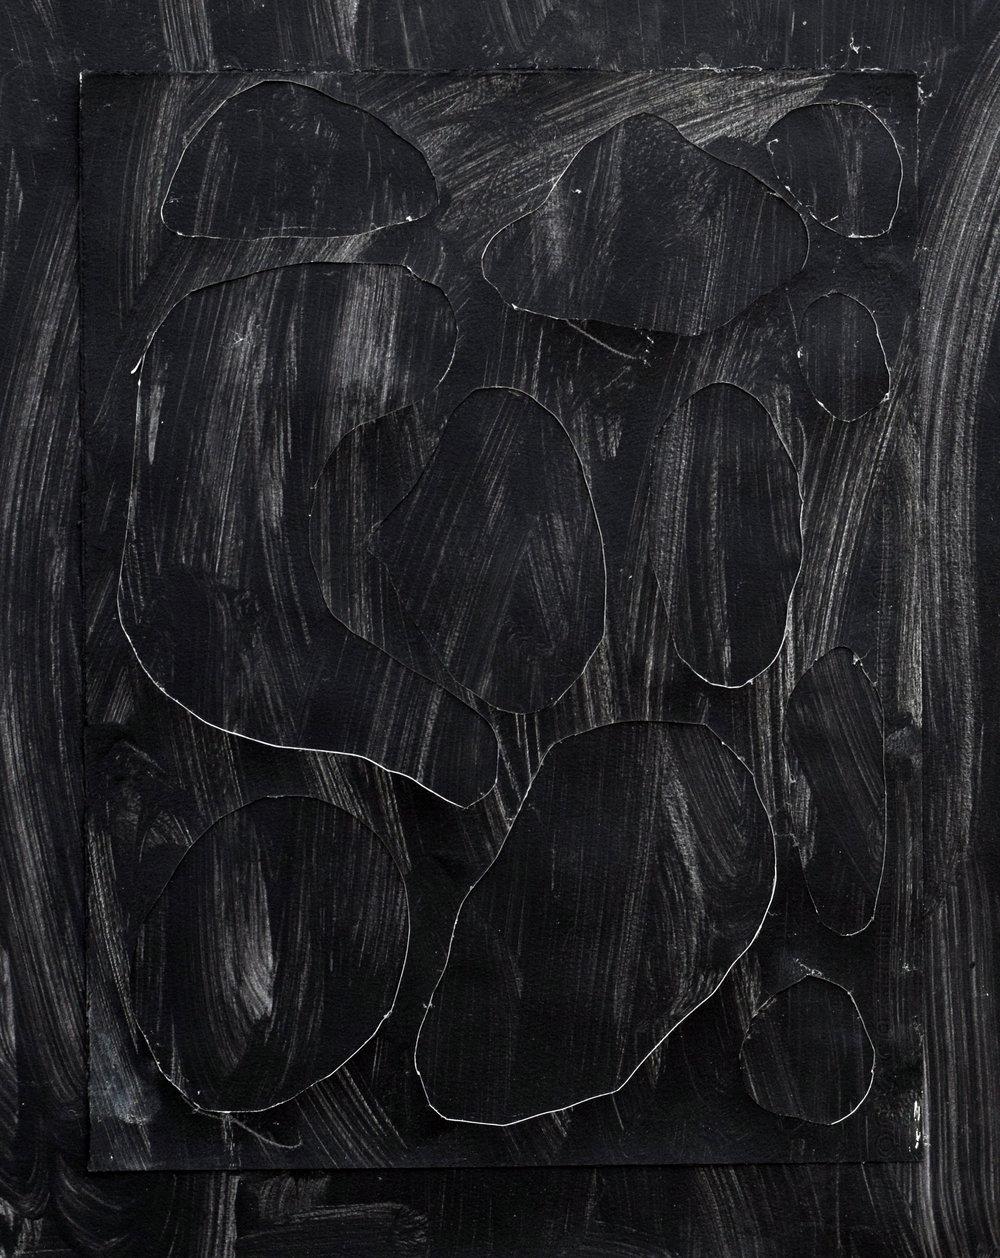 blackonblacksample.jpg